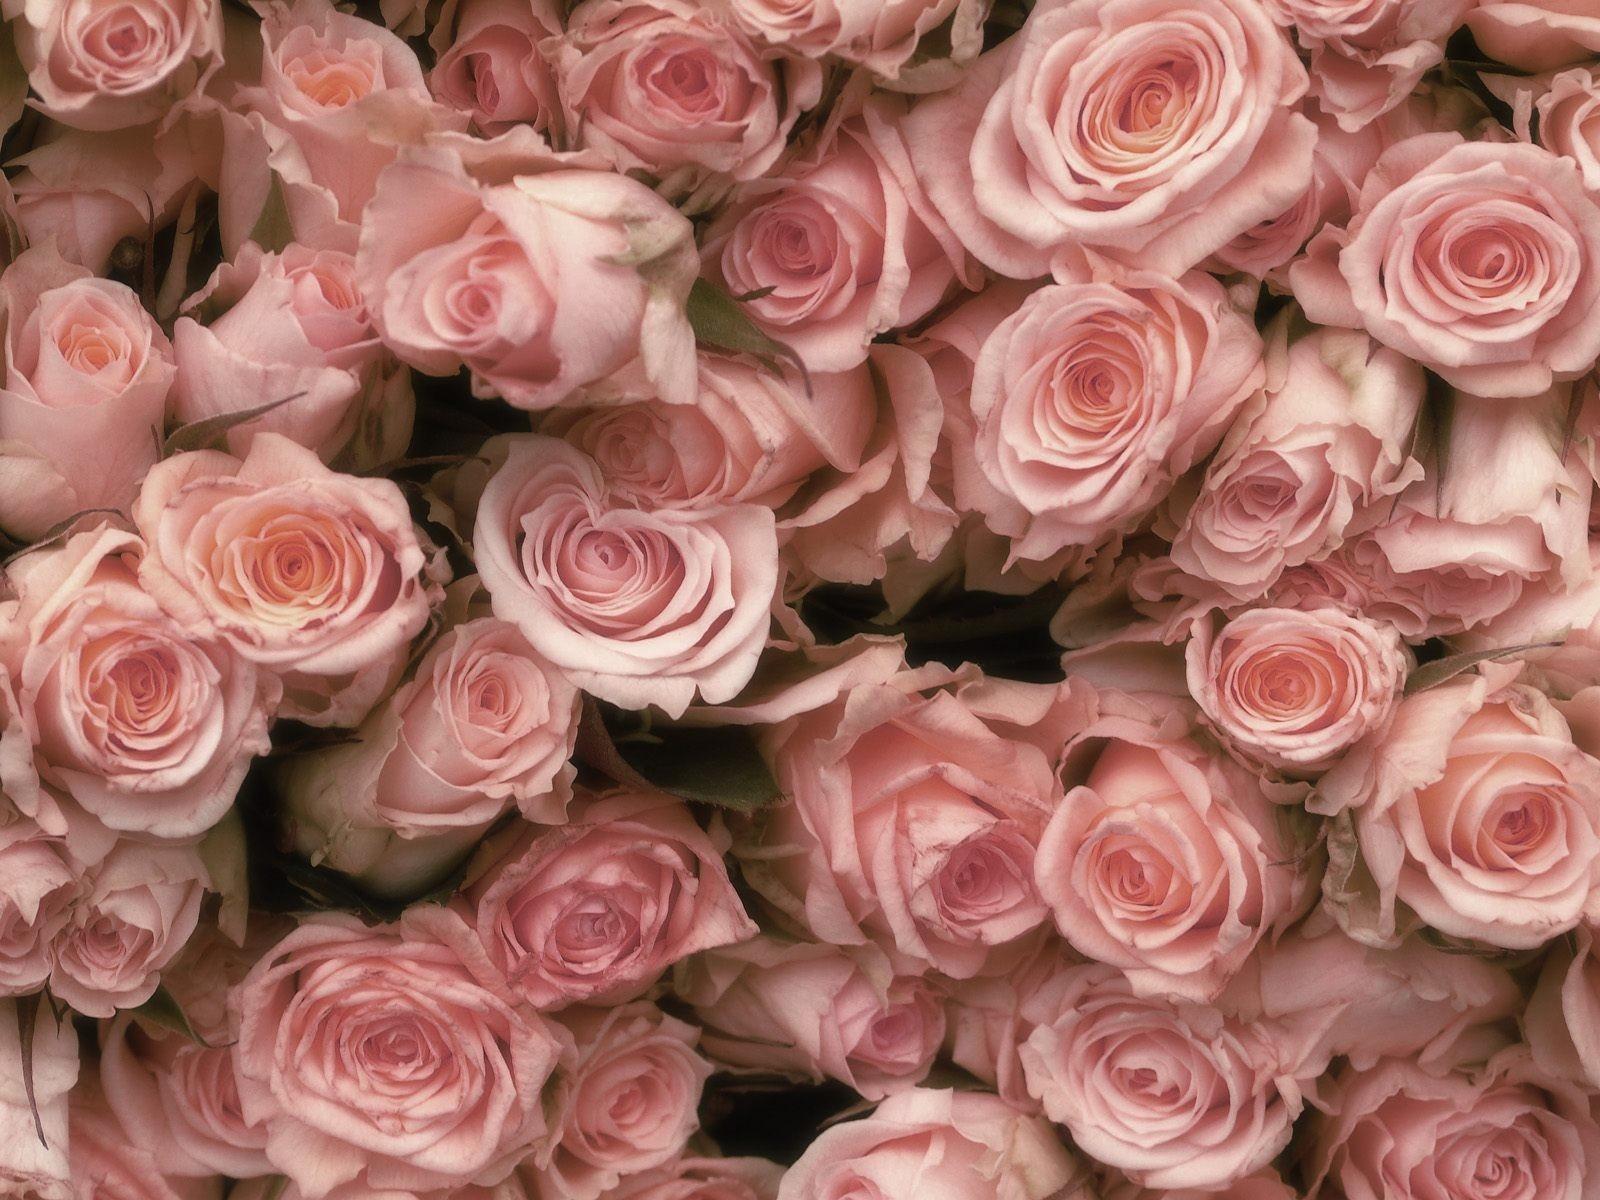 hintergrundbilder rose knospen rosa tender 1600x1200 1085000 hintergrundbilder wallhere. Black Bedroom Furniture Sets. Home Design Ideas